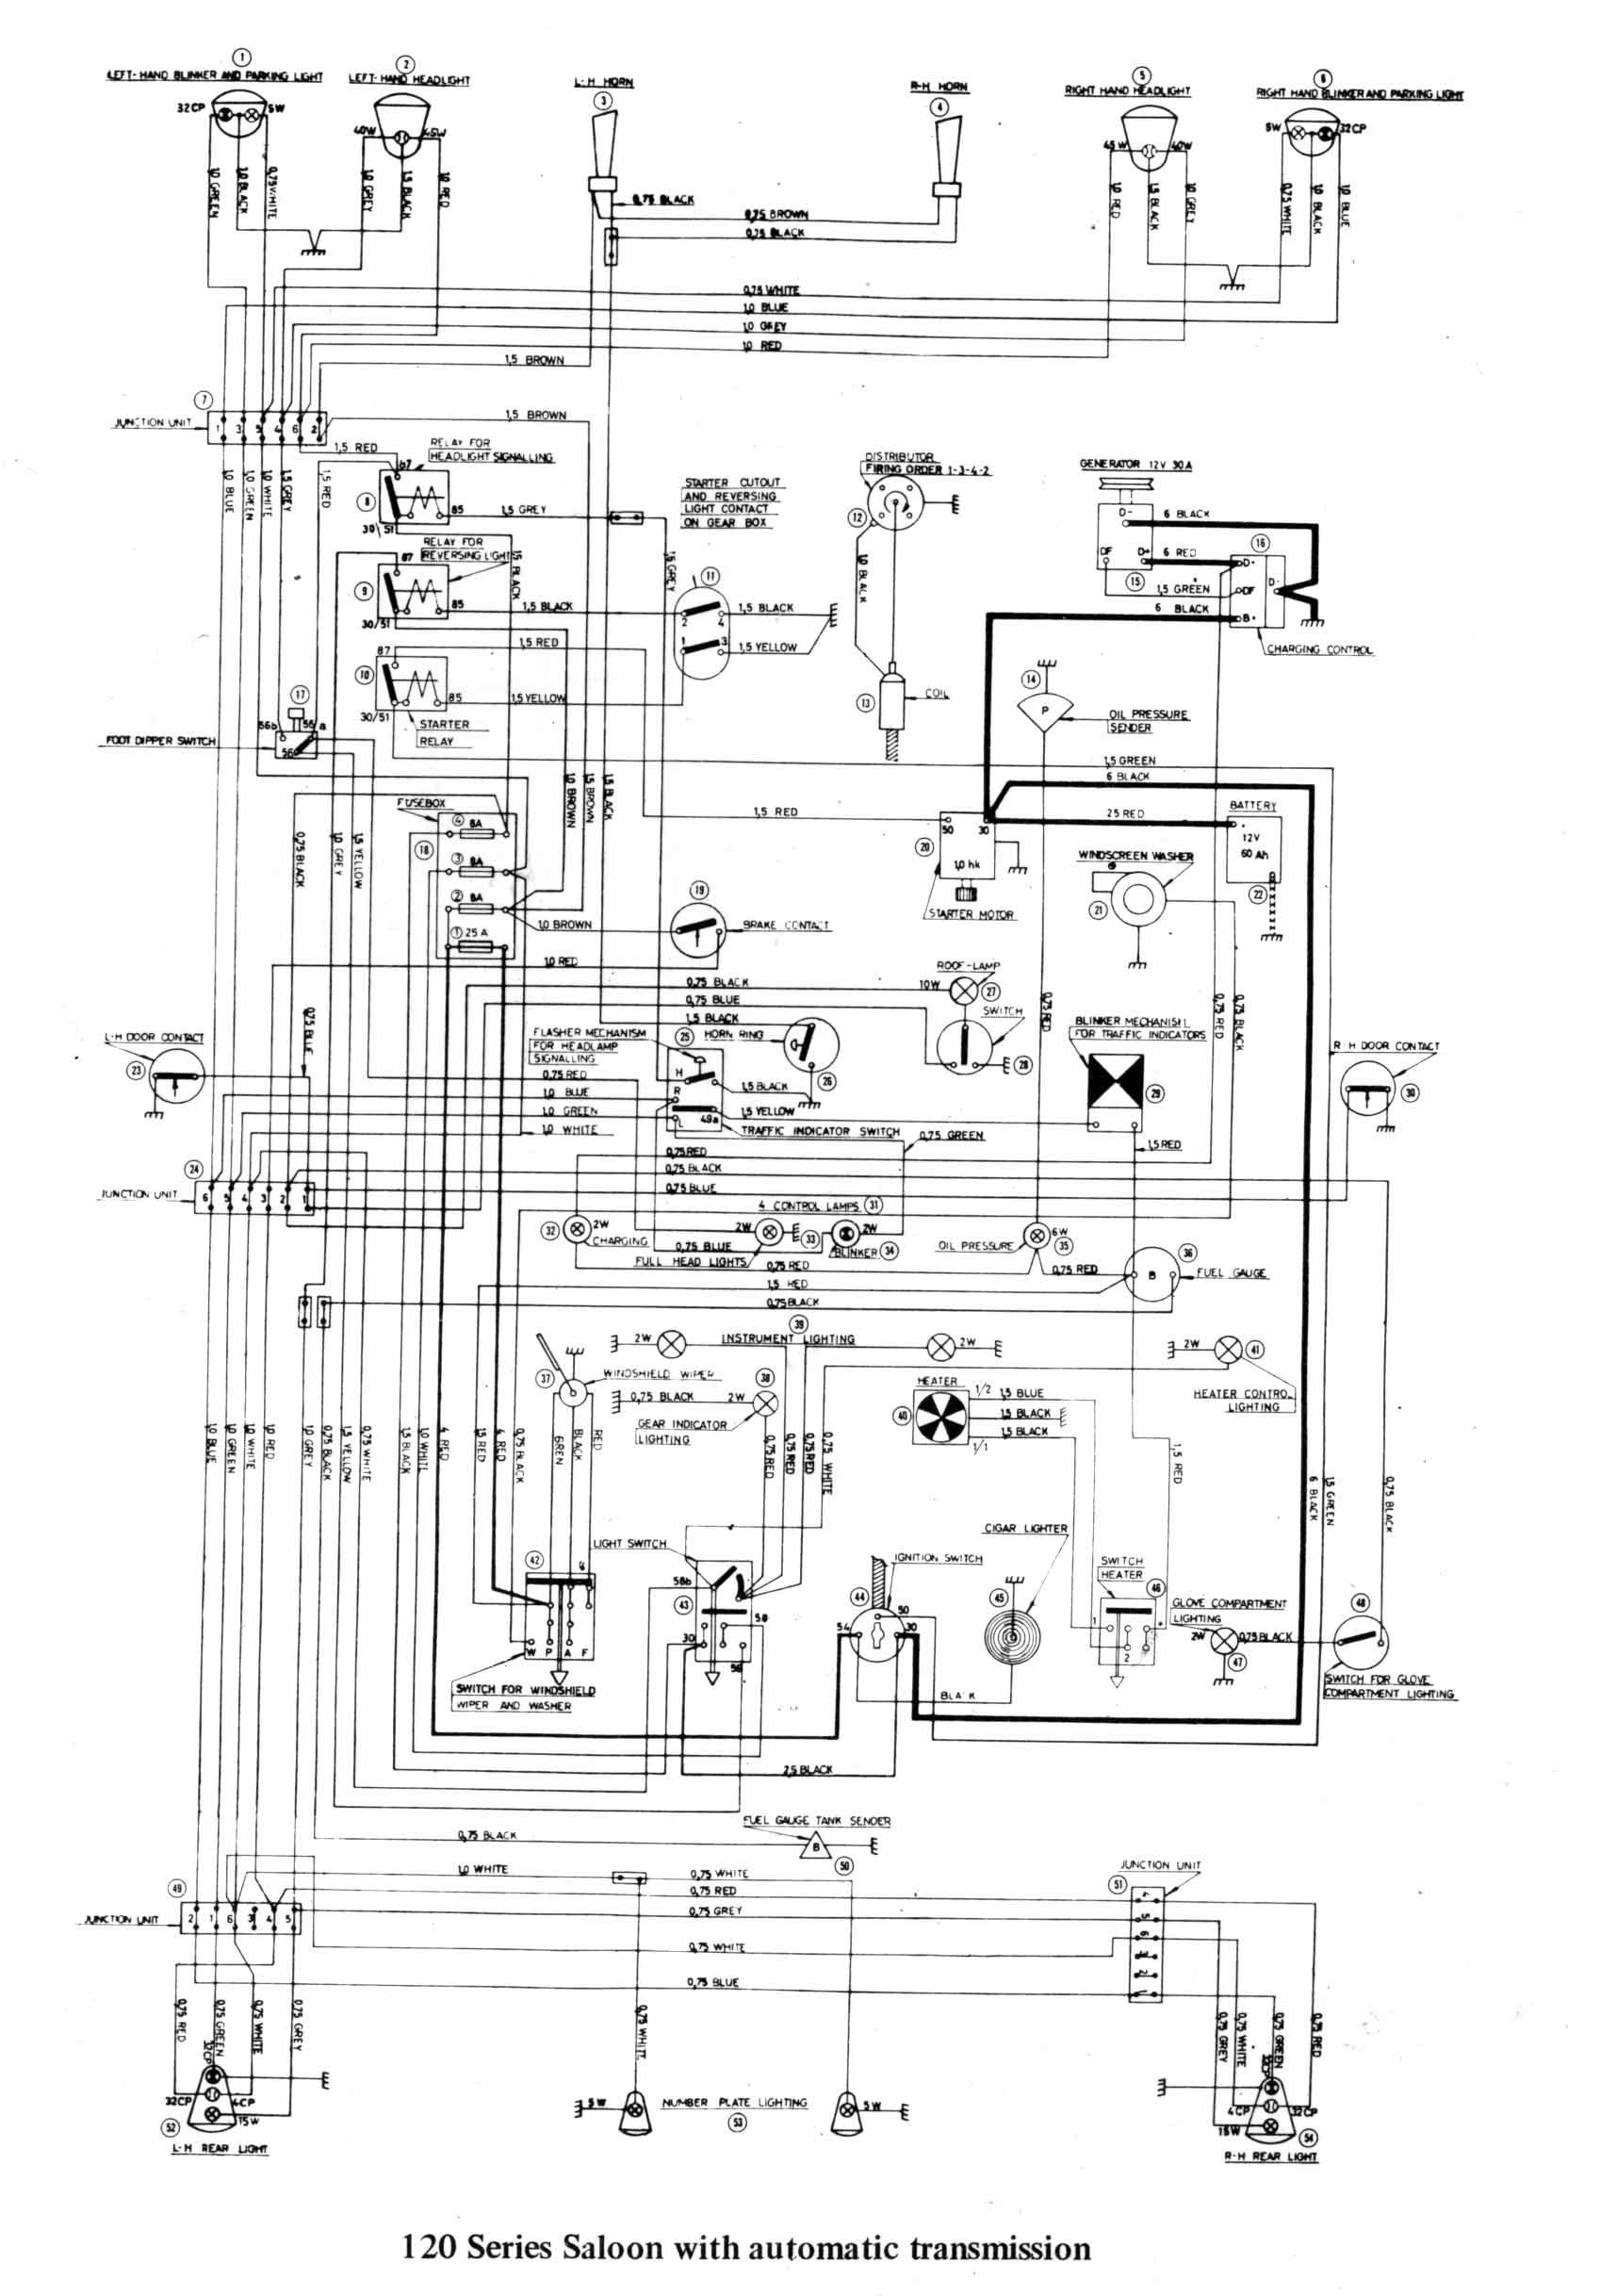 Volvo V40 Engine Diagram Volvo 740 Wiring Diagram Fitfathers Me Amazing Blurts Of Volvo V40 Engine Diagram